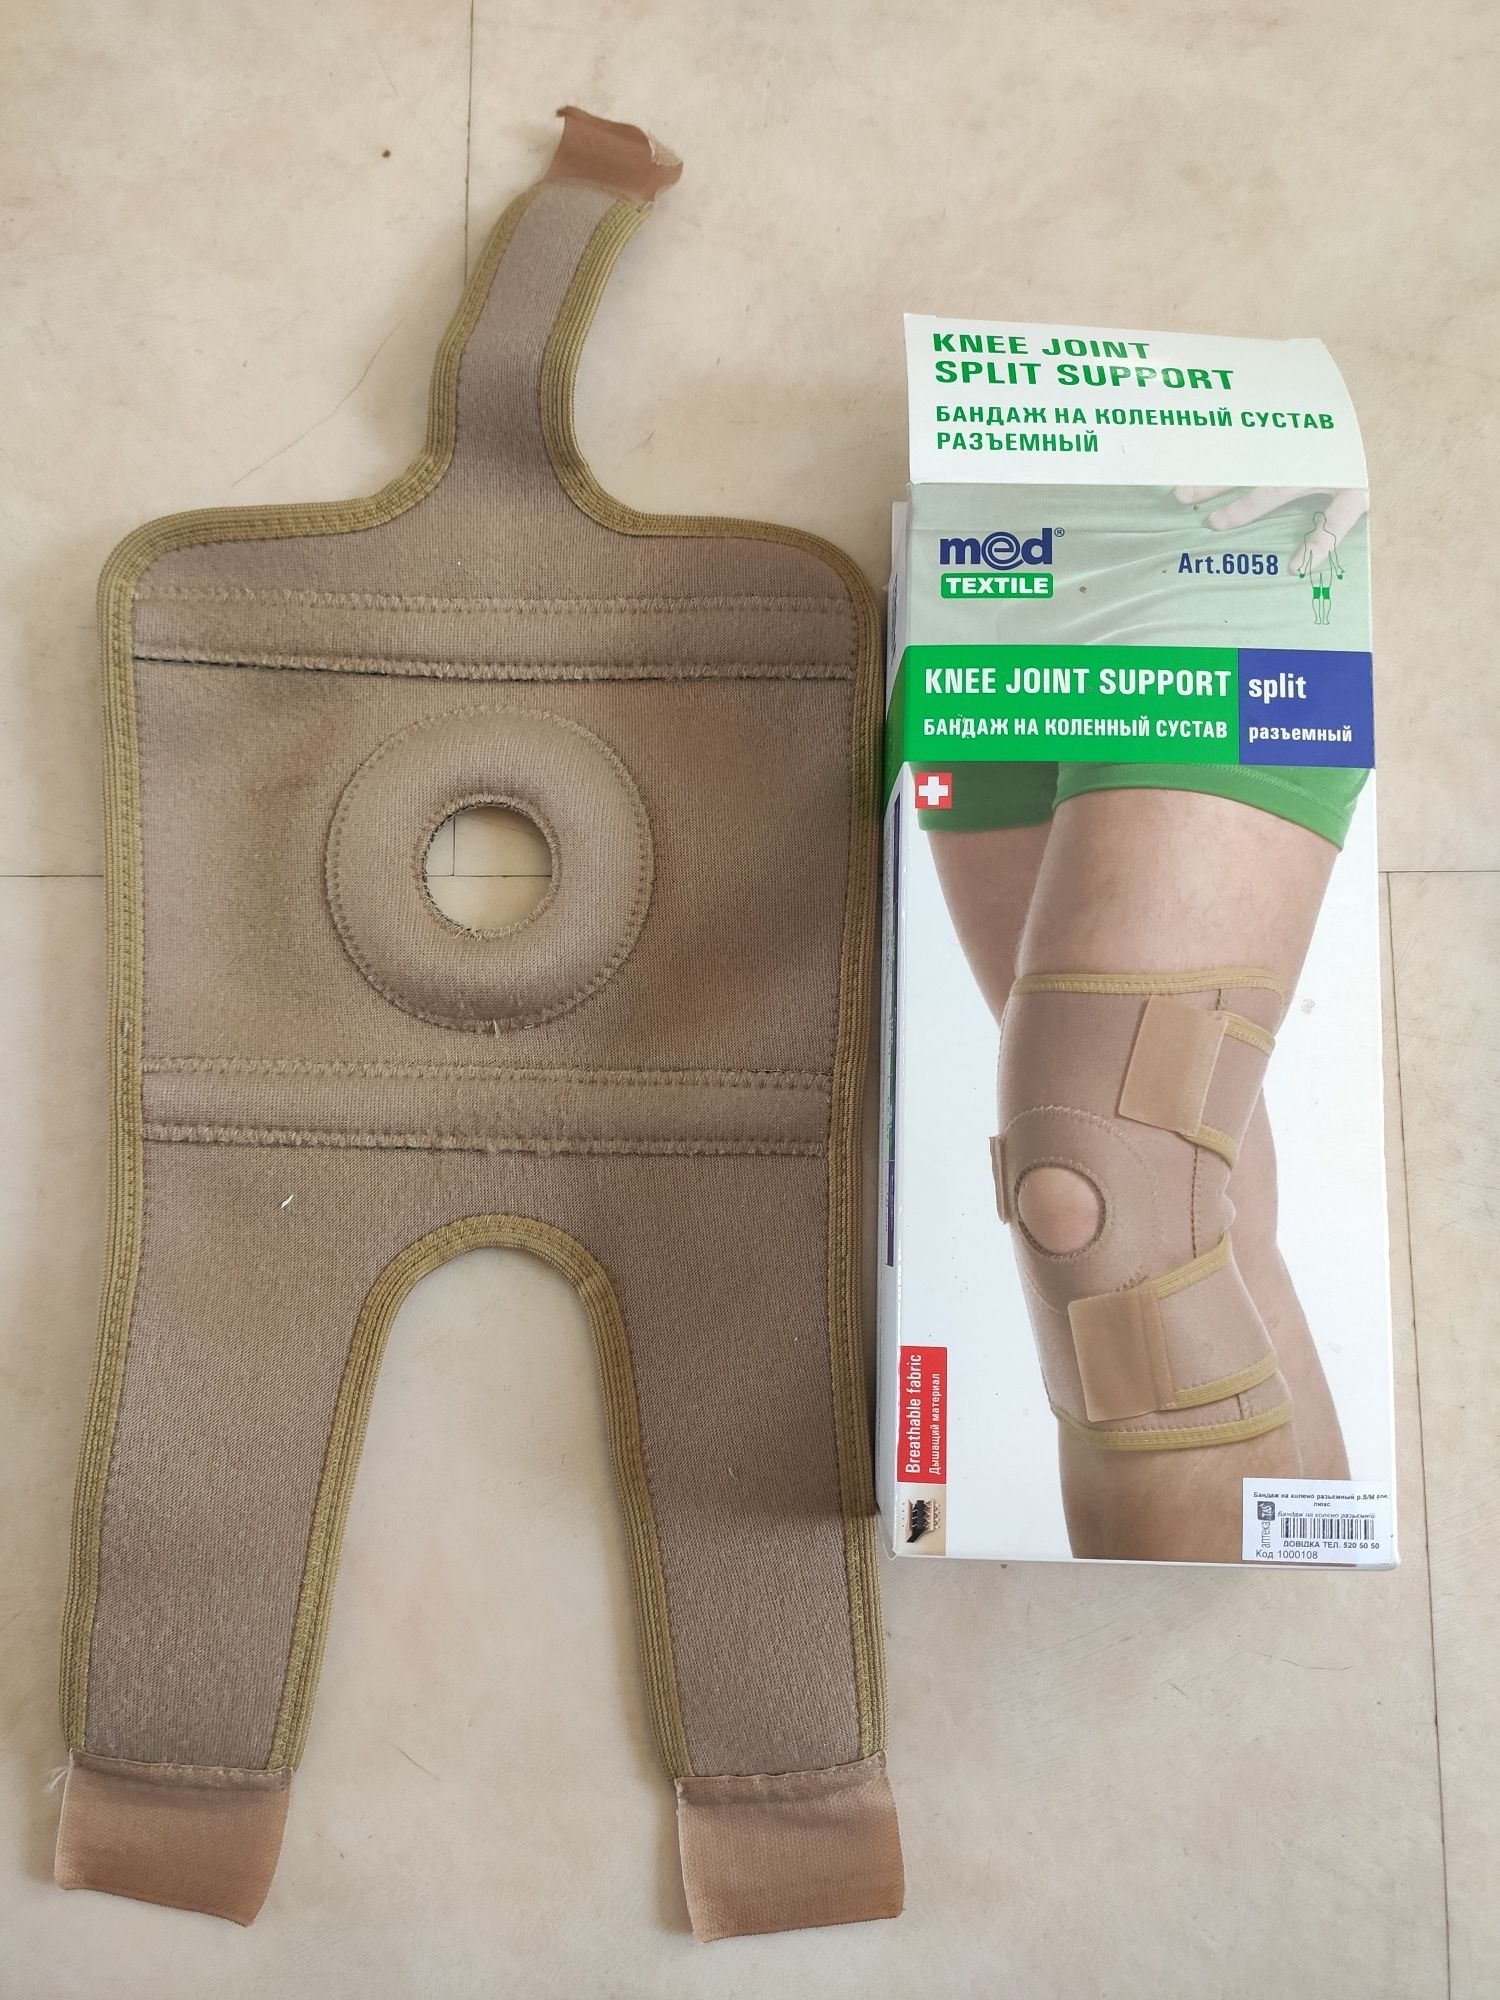 Бандаж на коленный сустав разъёмный Med Textile